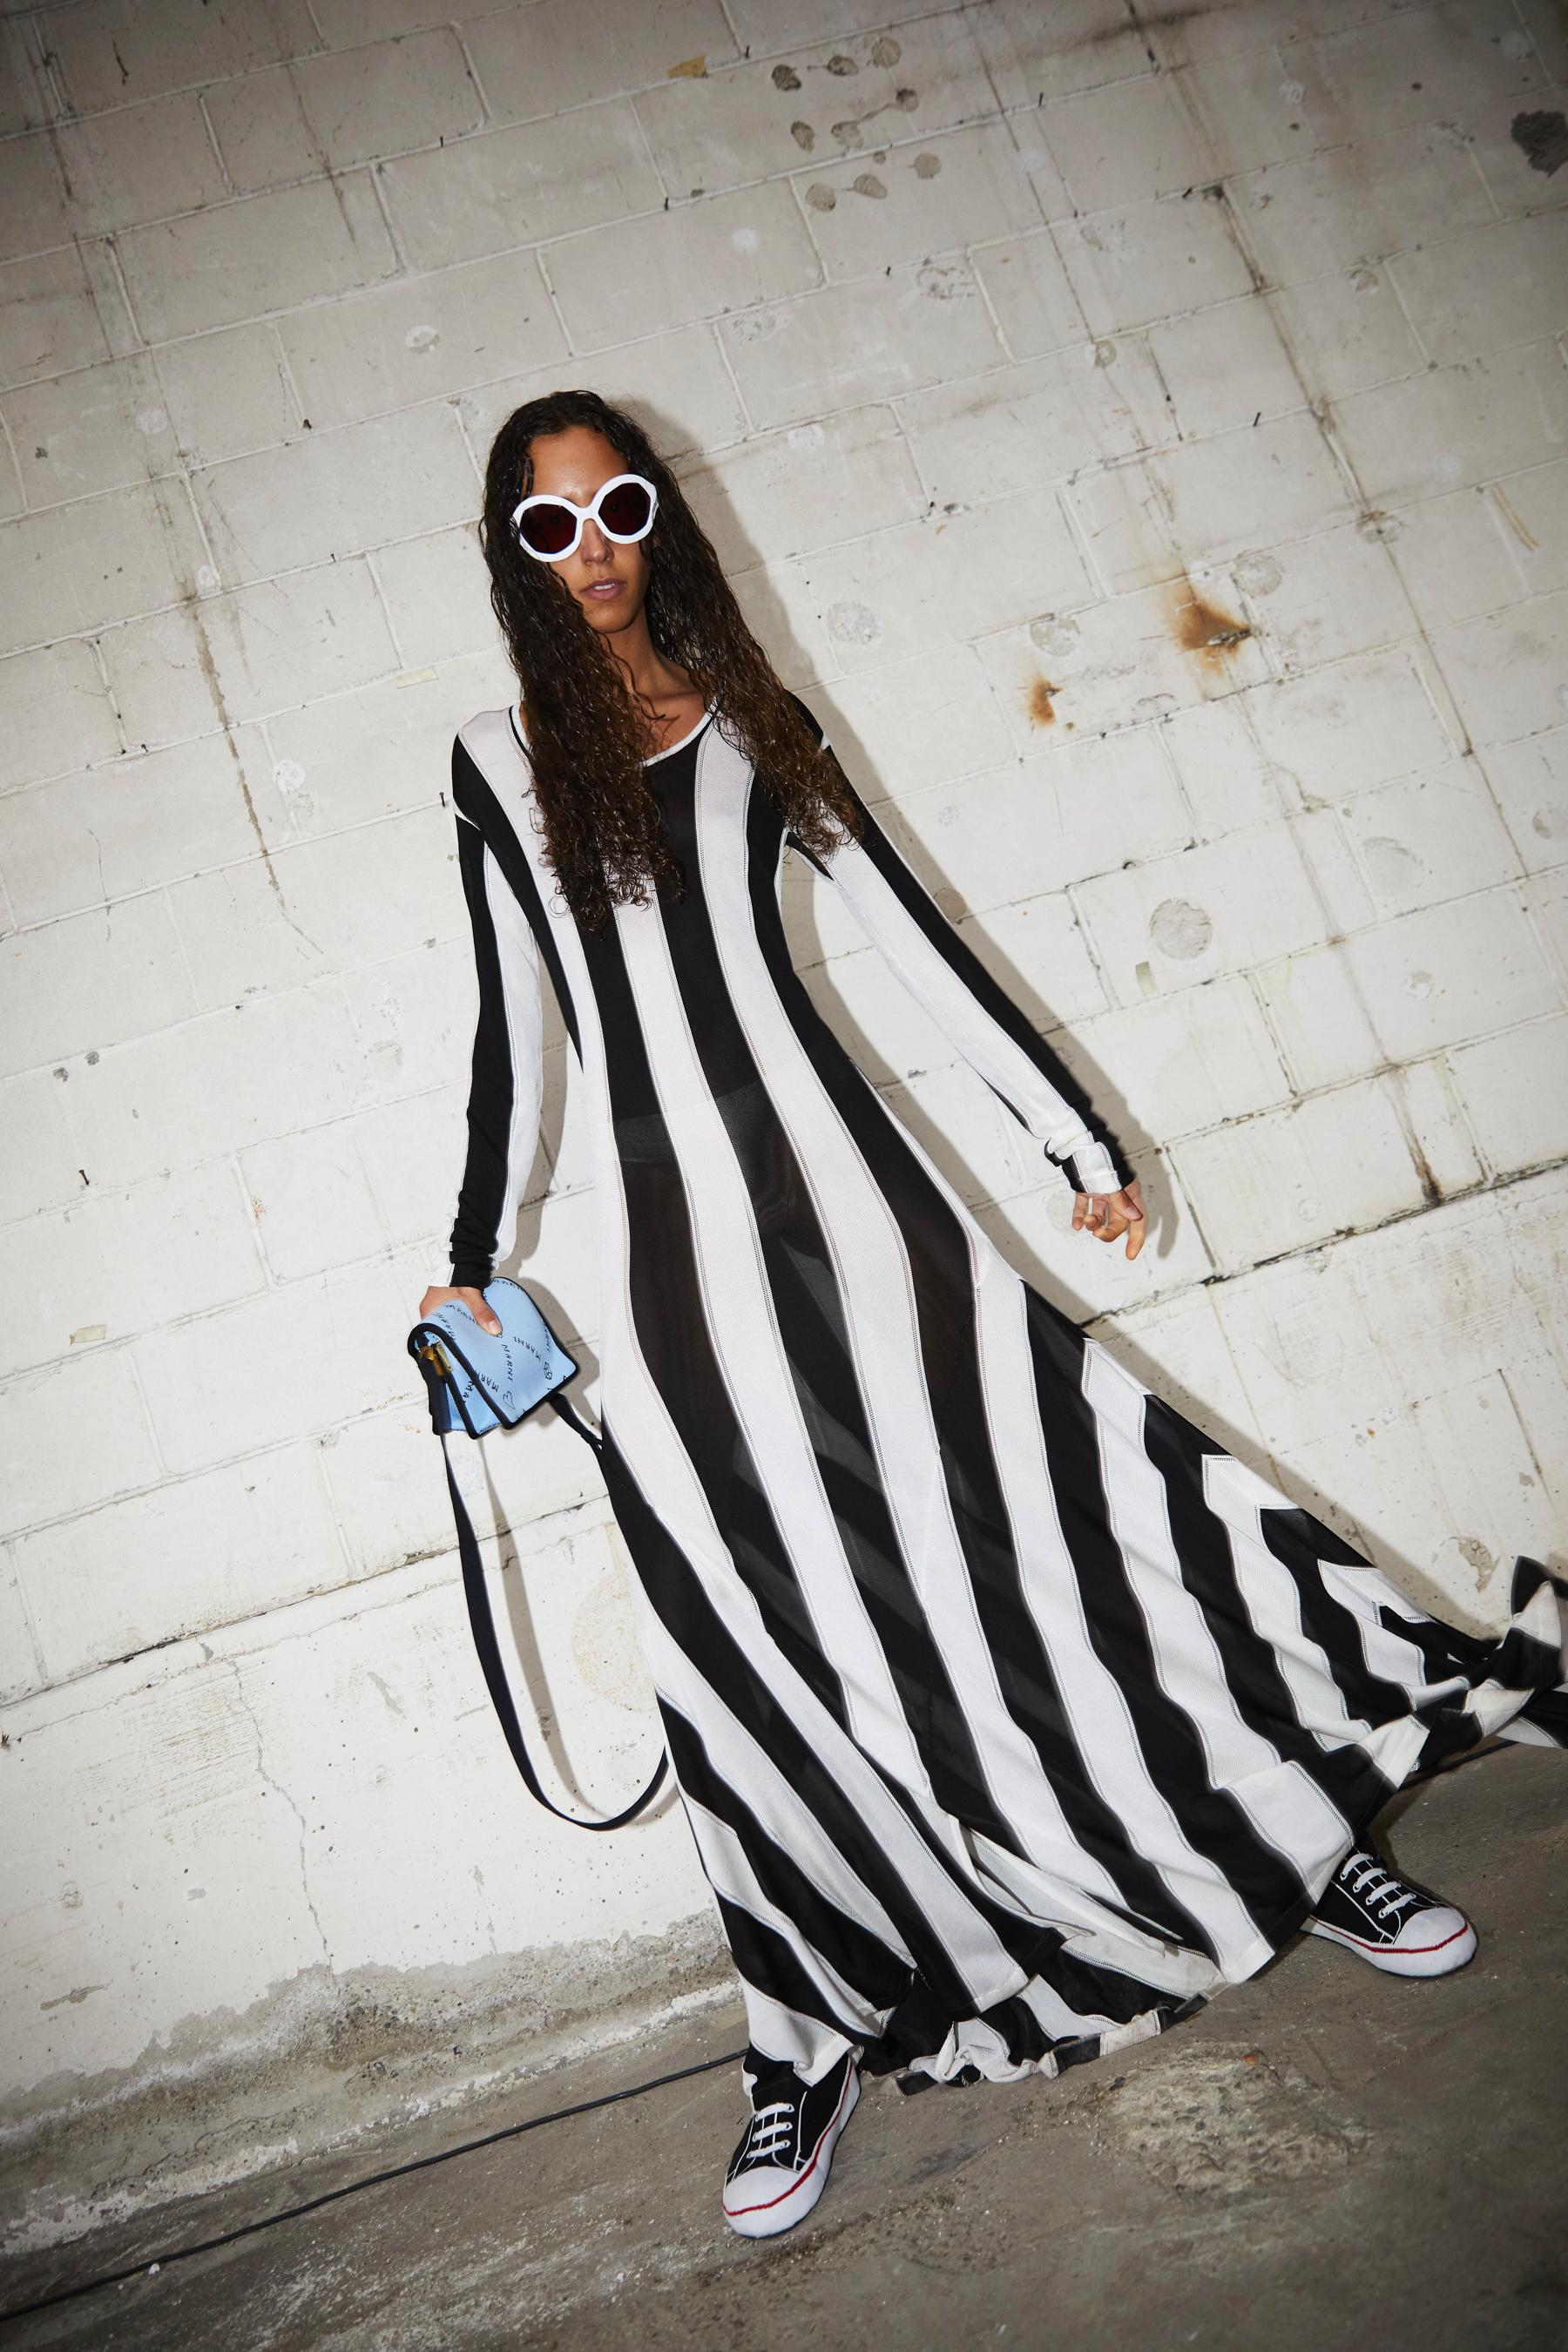 Marni Spring 2022 Backstage Fashion Show